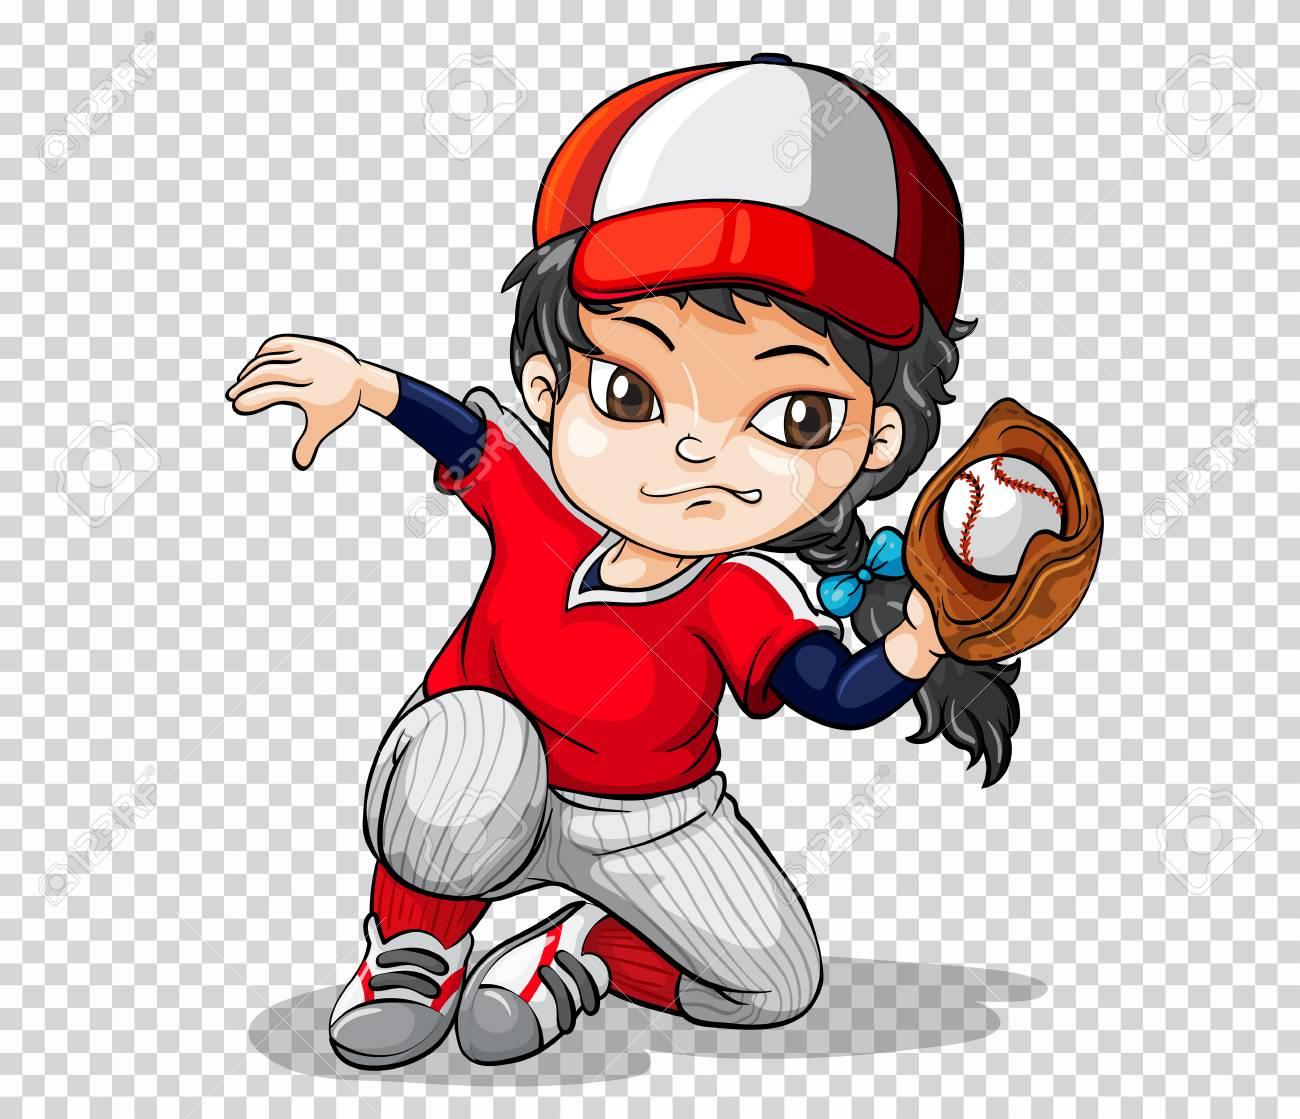 Girl baseball player on transparent background illustration.